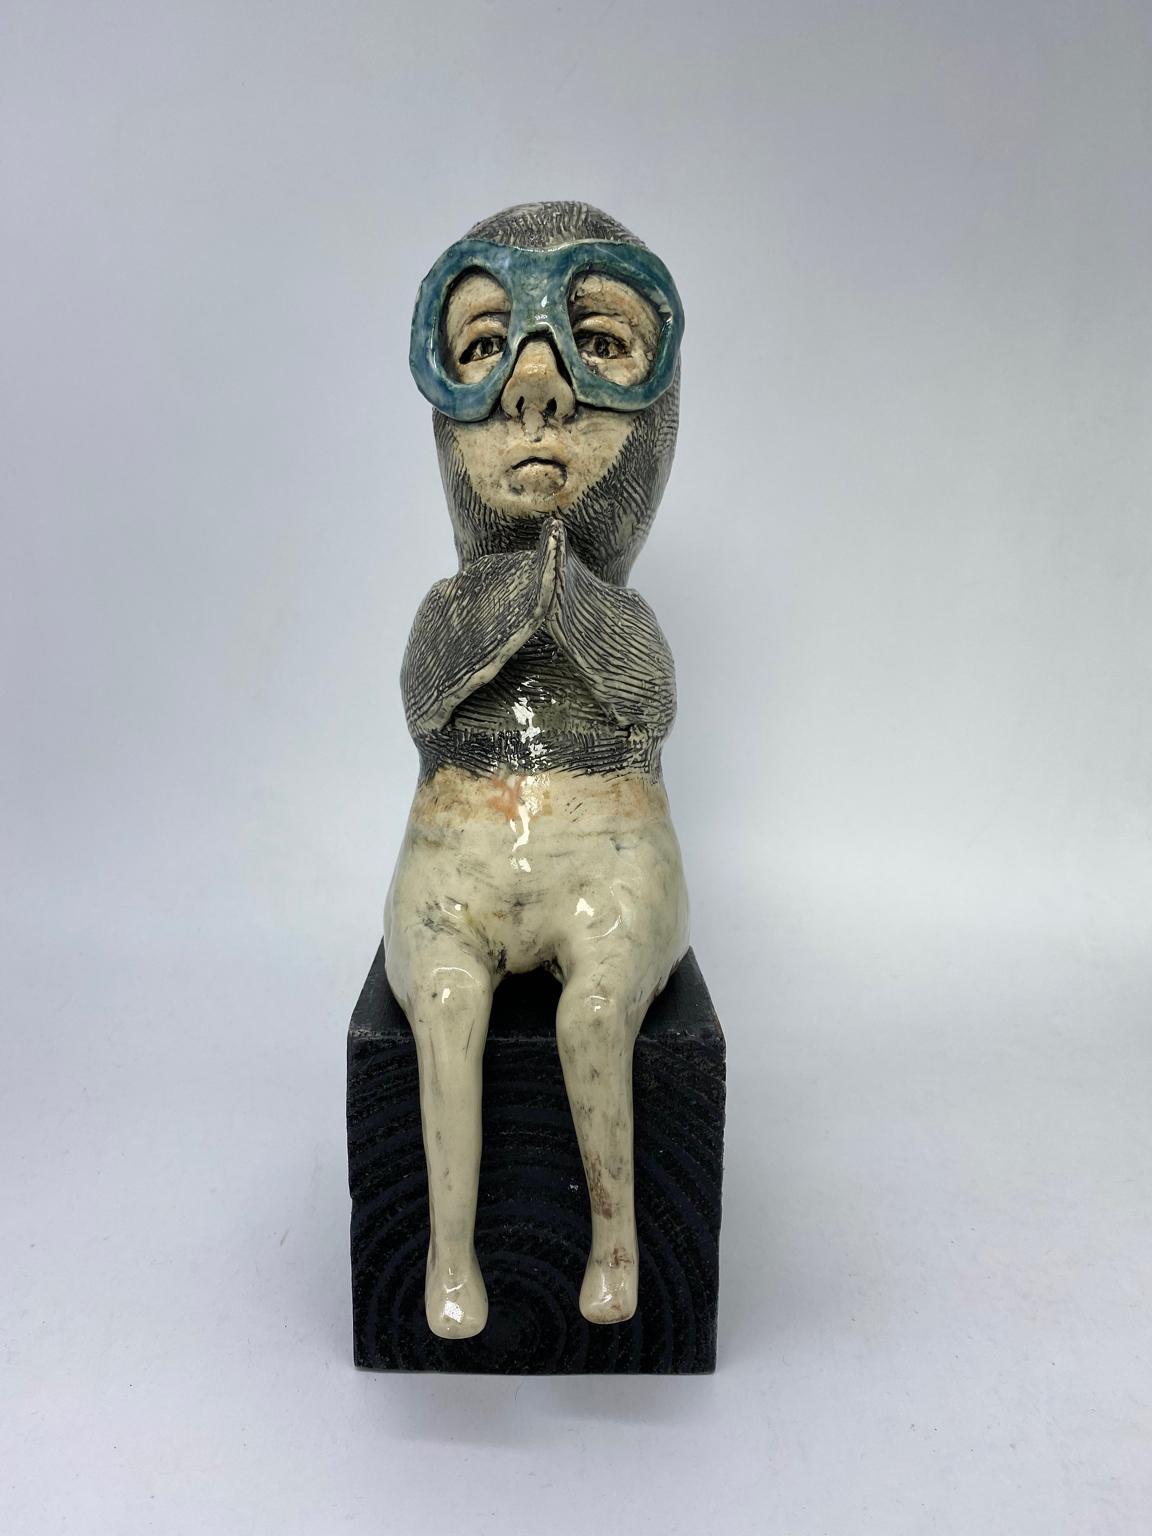 Figurative Ceramic Sculpture: 'Oh That Is Inspiring'